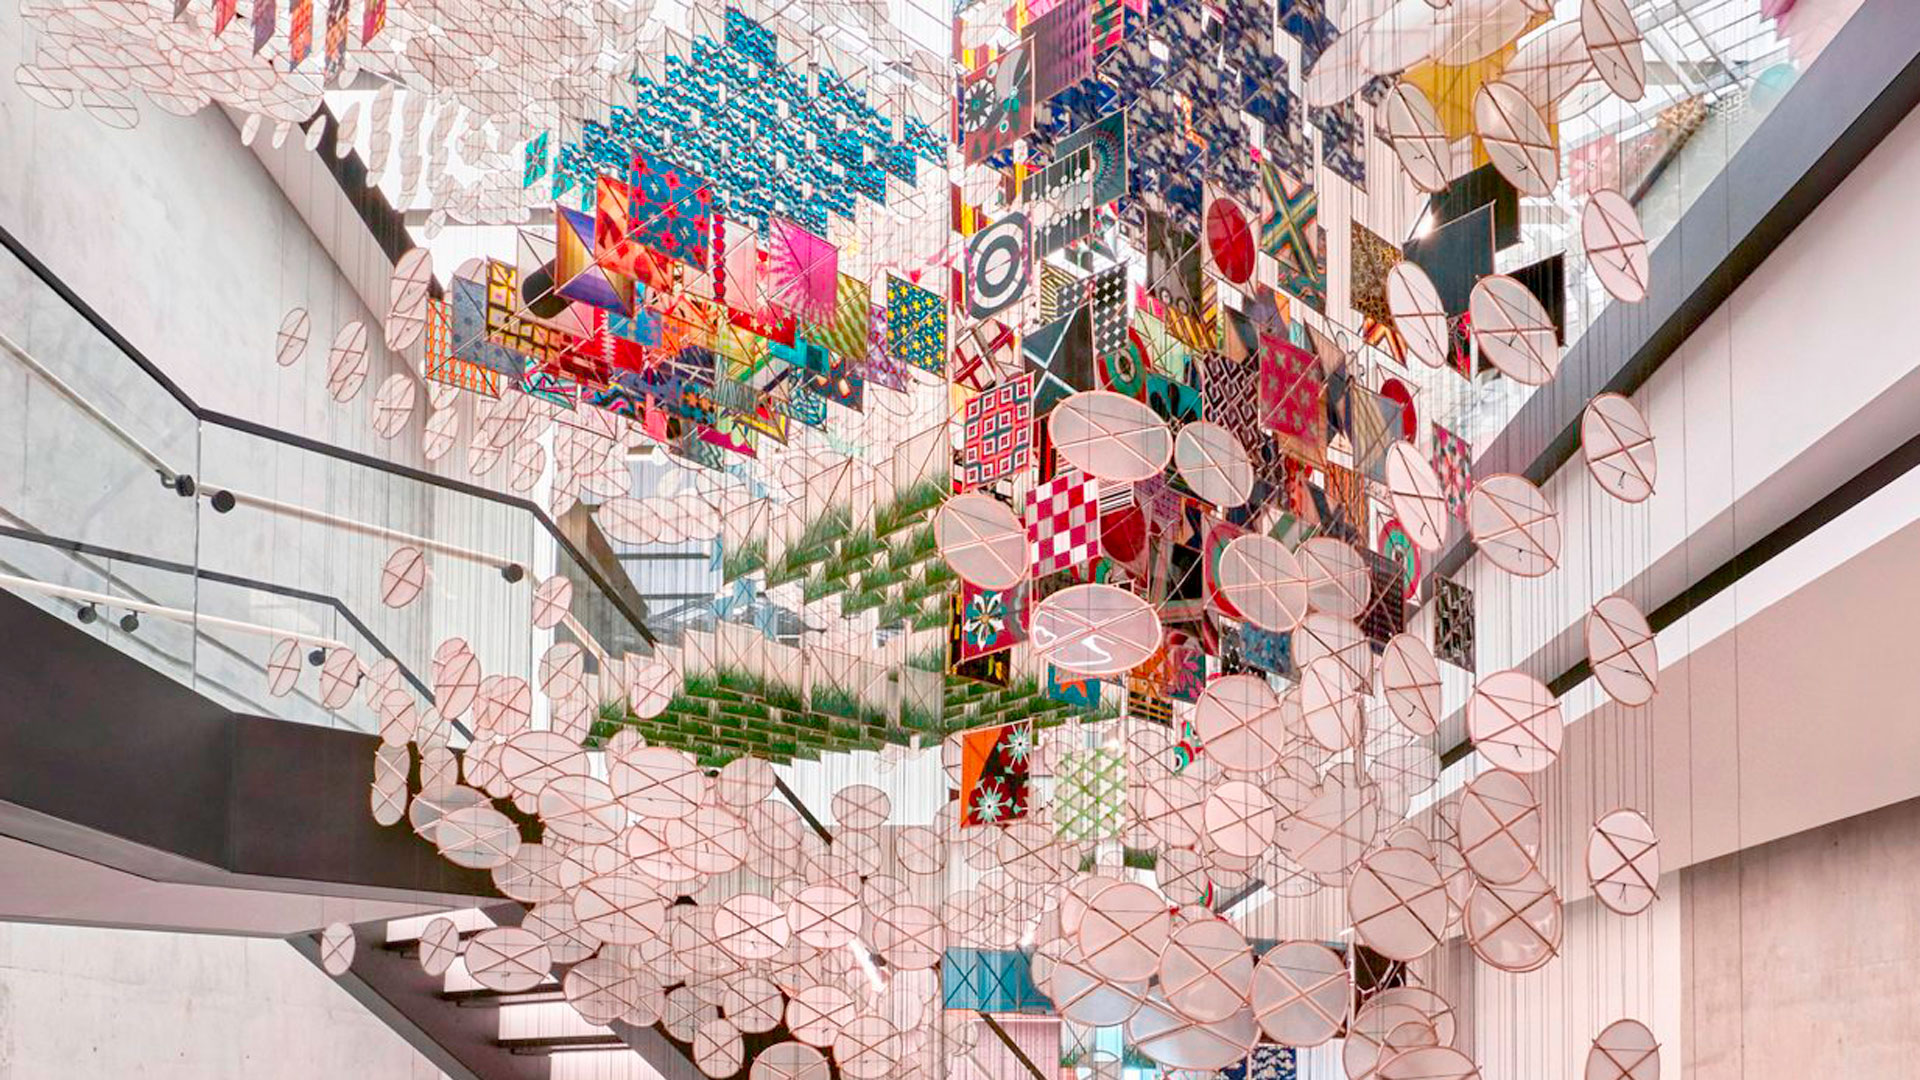 Hamburguesas rodeadas de arte hero asset